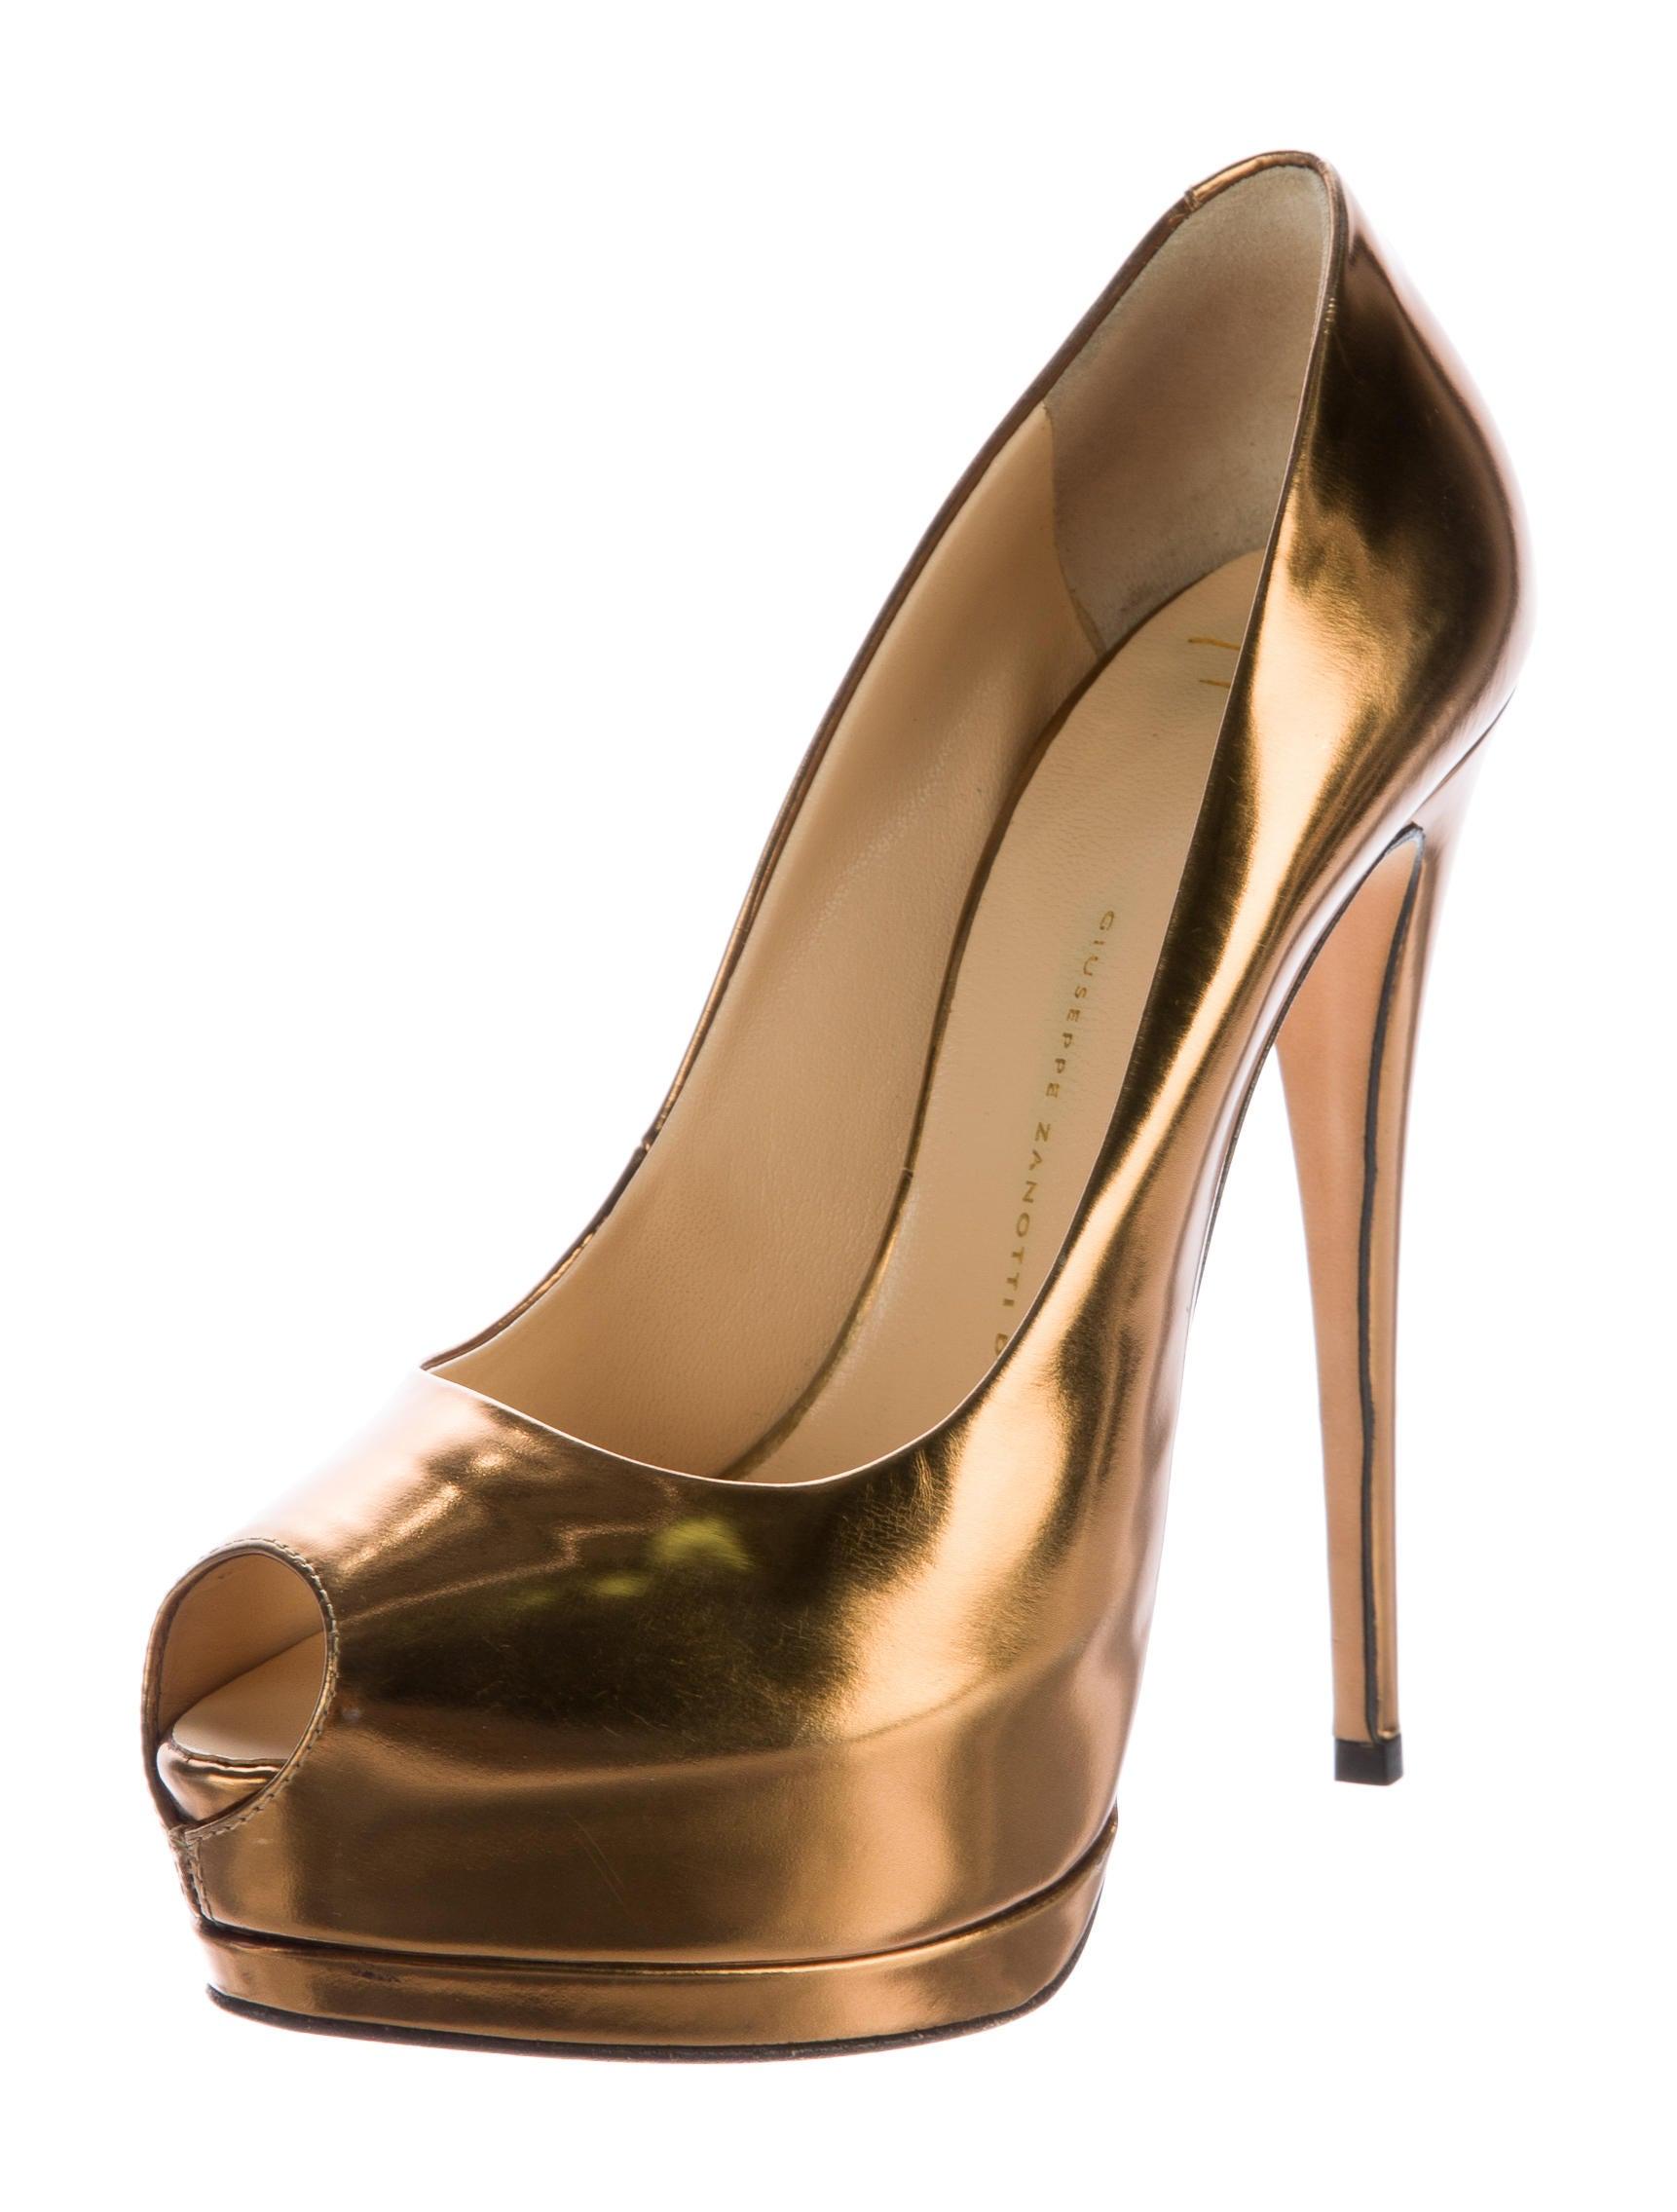 05cf9d8604 Giuseppe Zanotti Design Heels Facebook Girls Dress Shoes   UAE CONSULATE